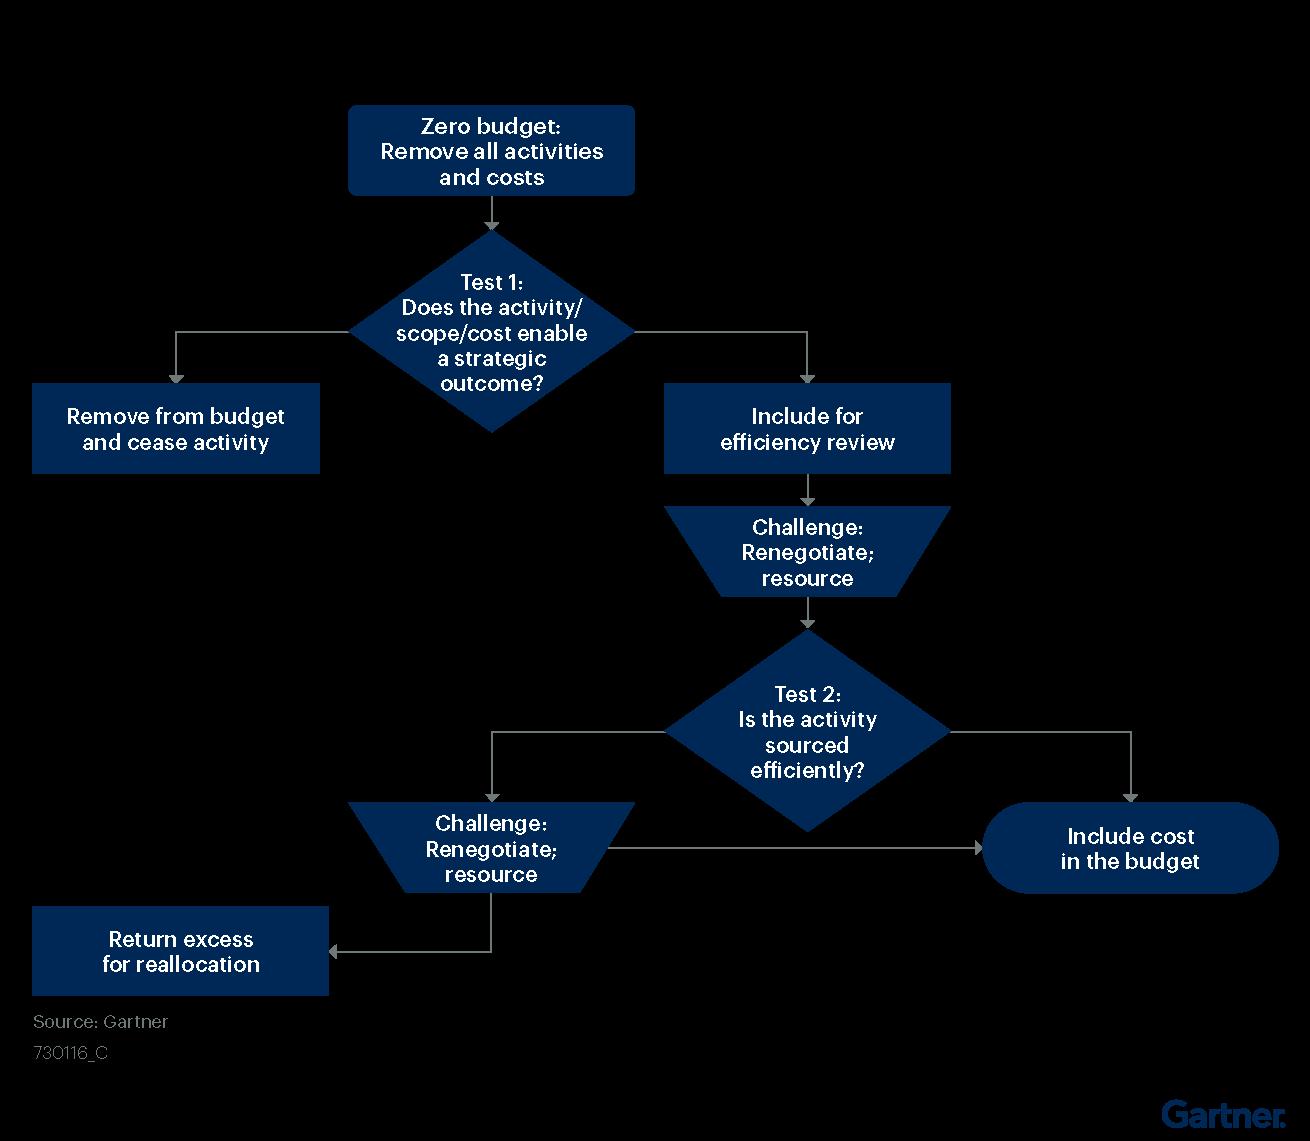 Figure 1. ZBB Decision Tree